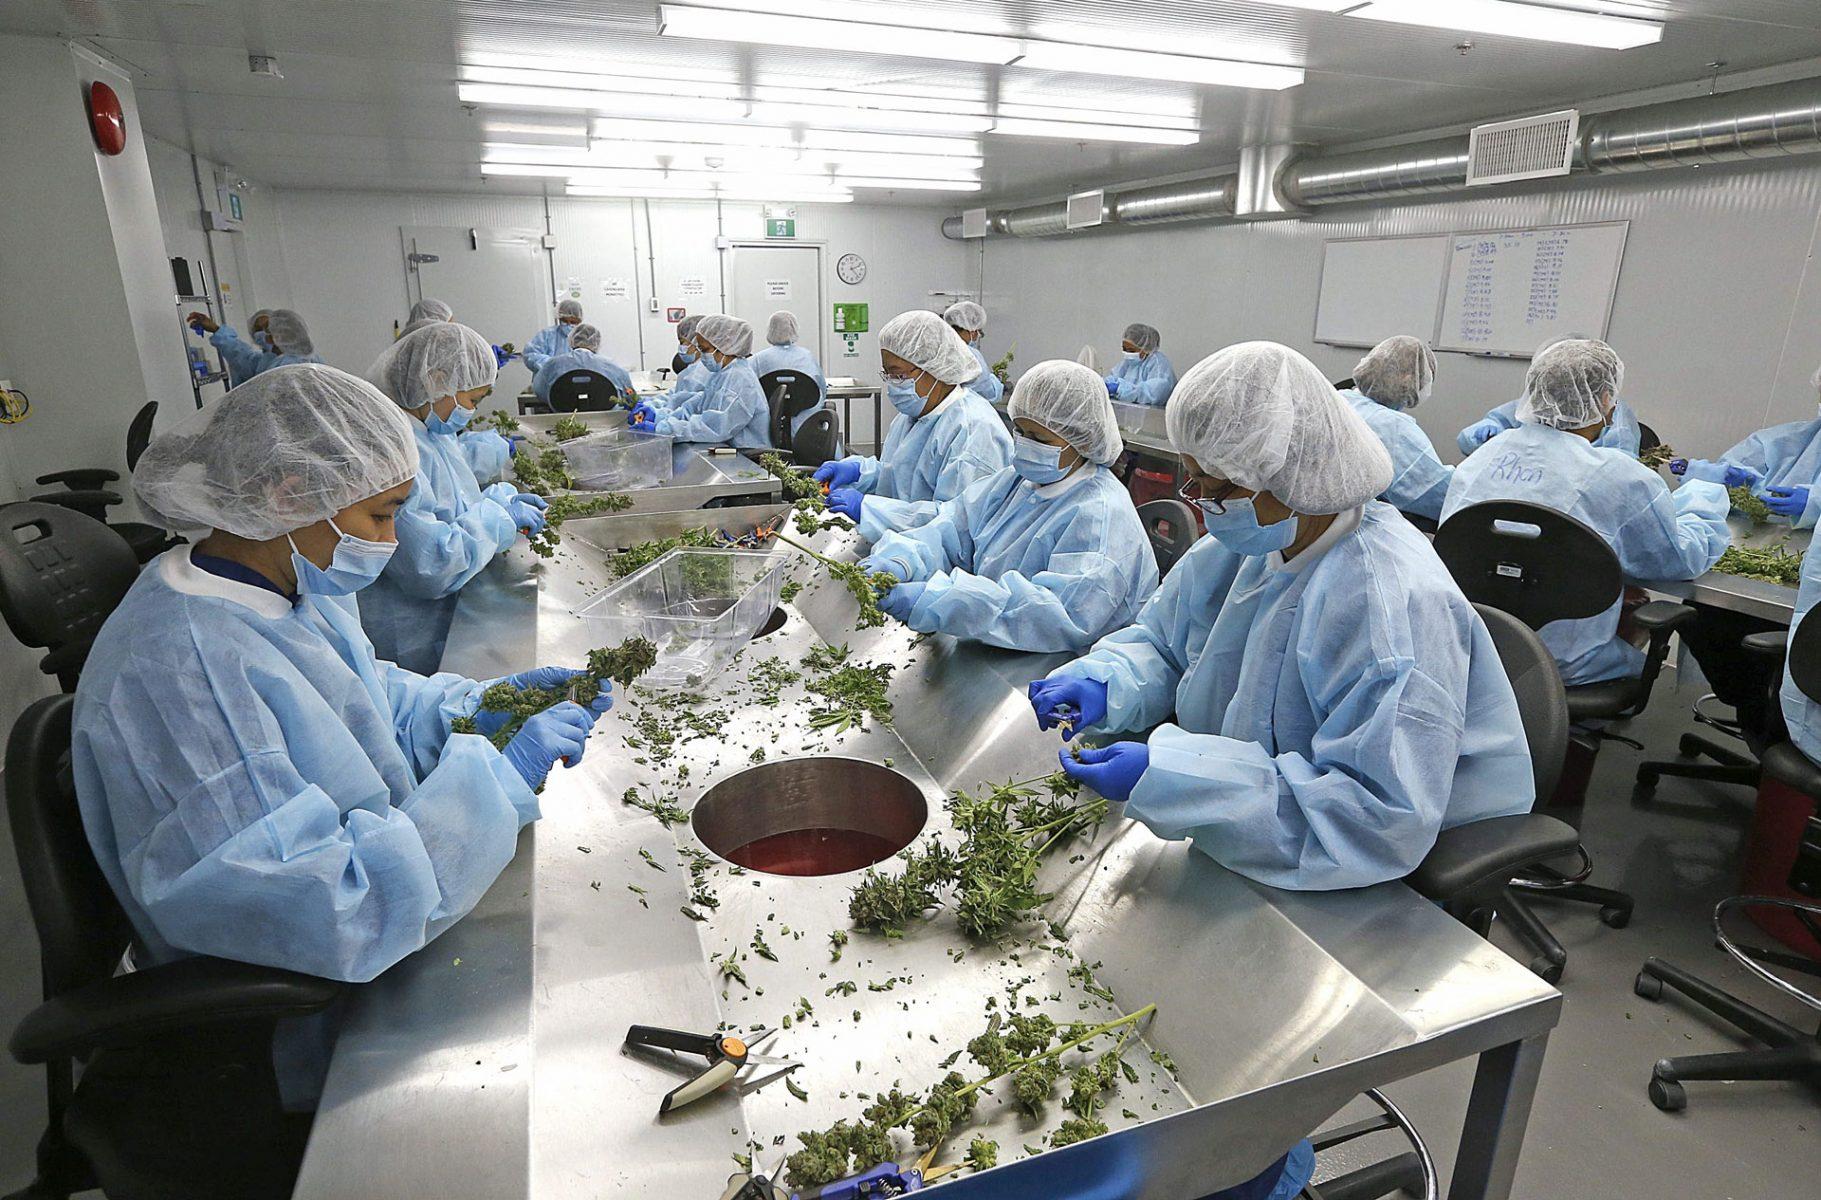 cannabis processing facility